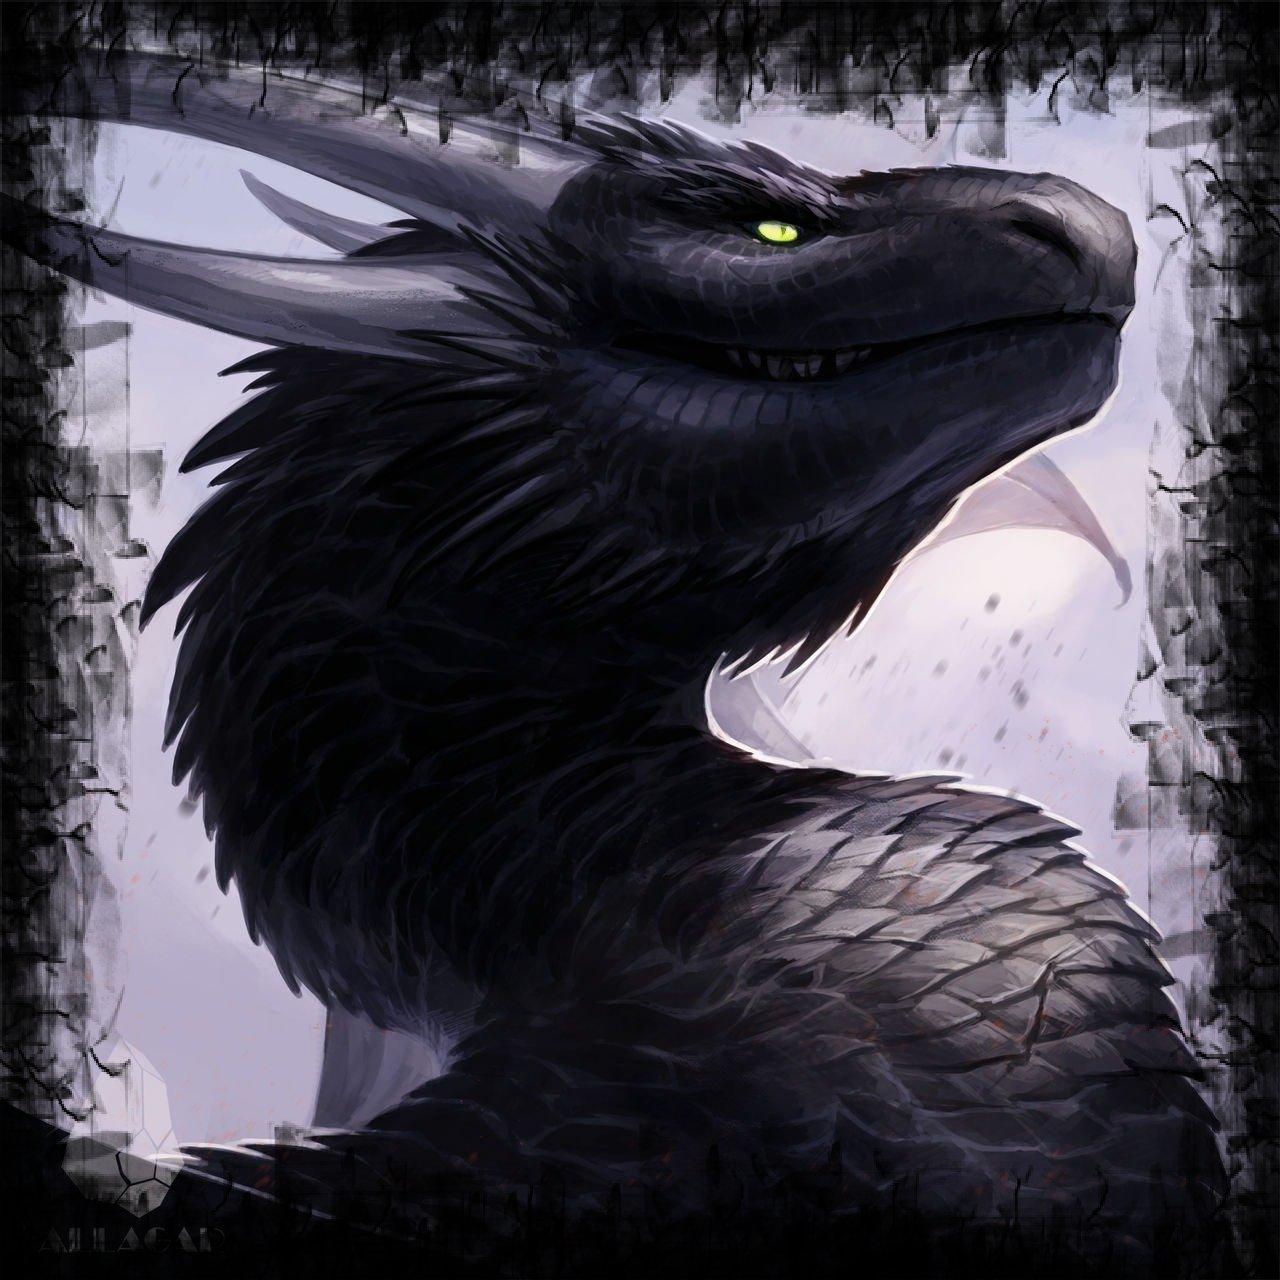 Dragon Breeding Fantasy- Chloe's Ripping Experience! - Part 1